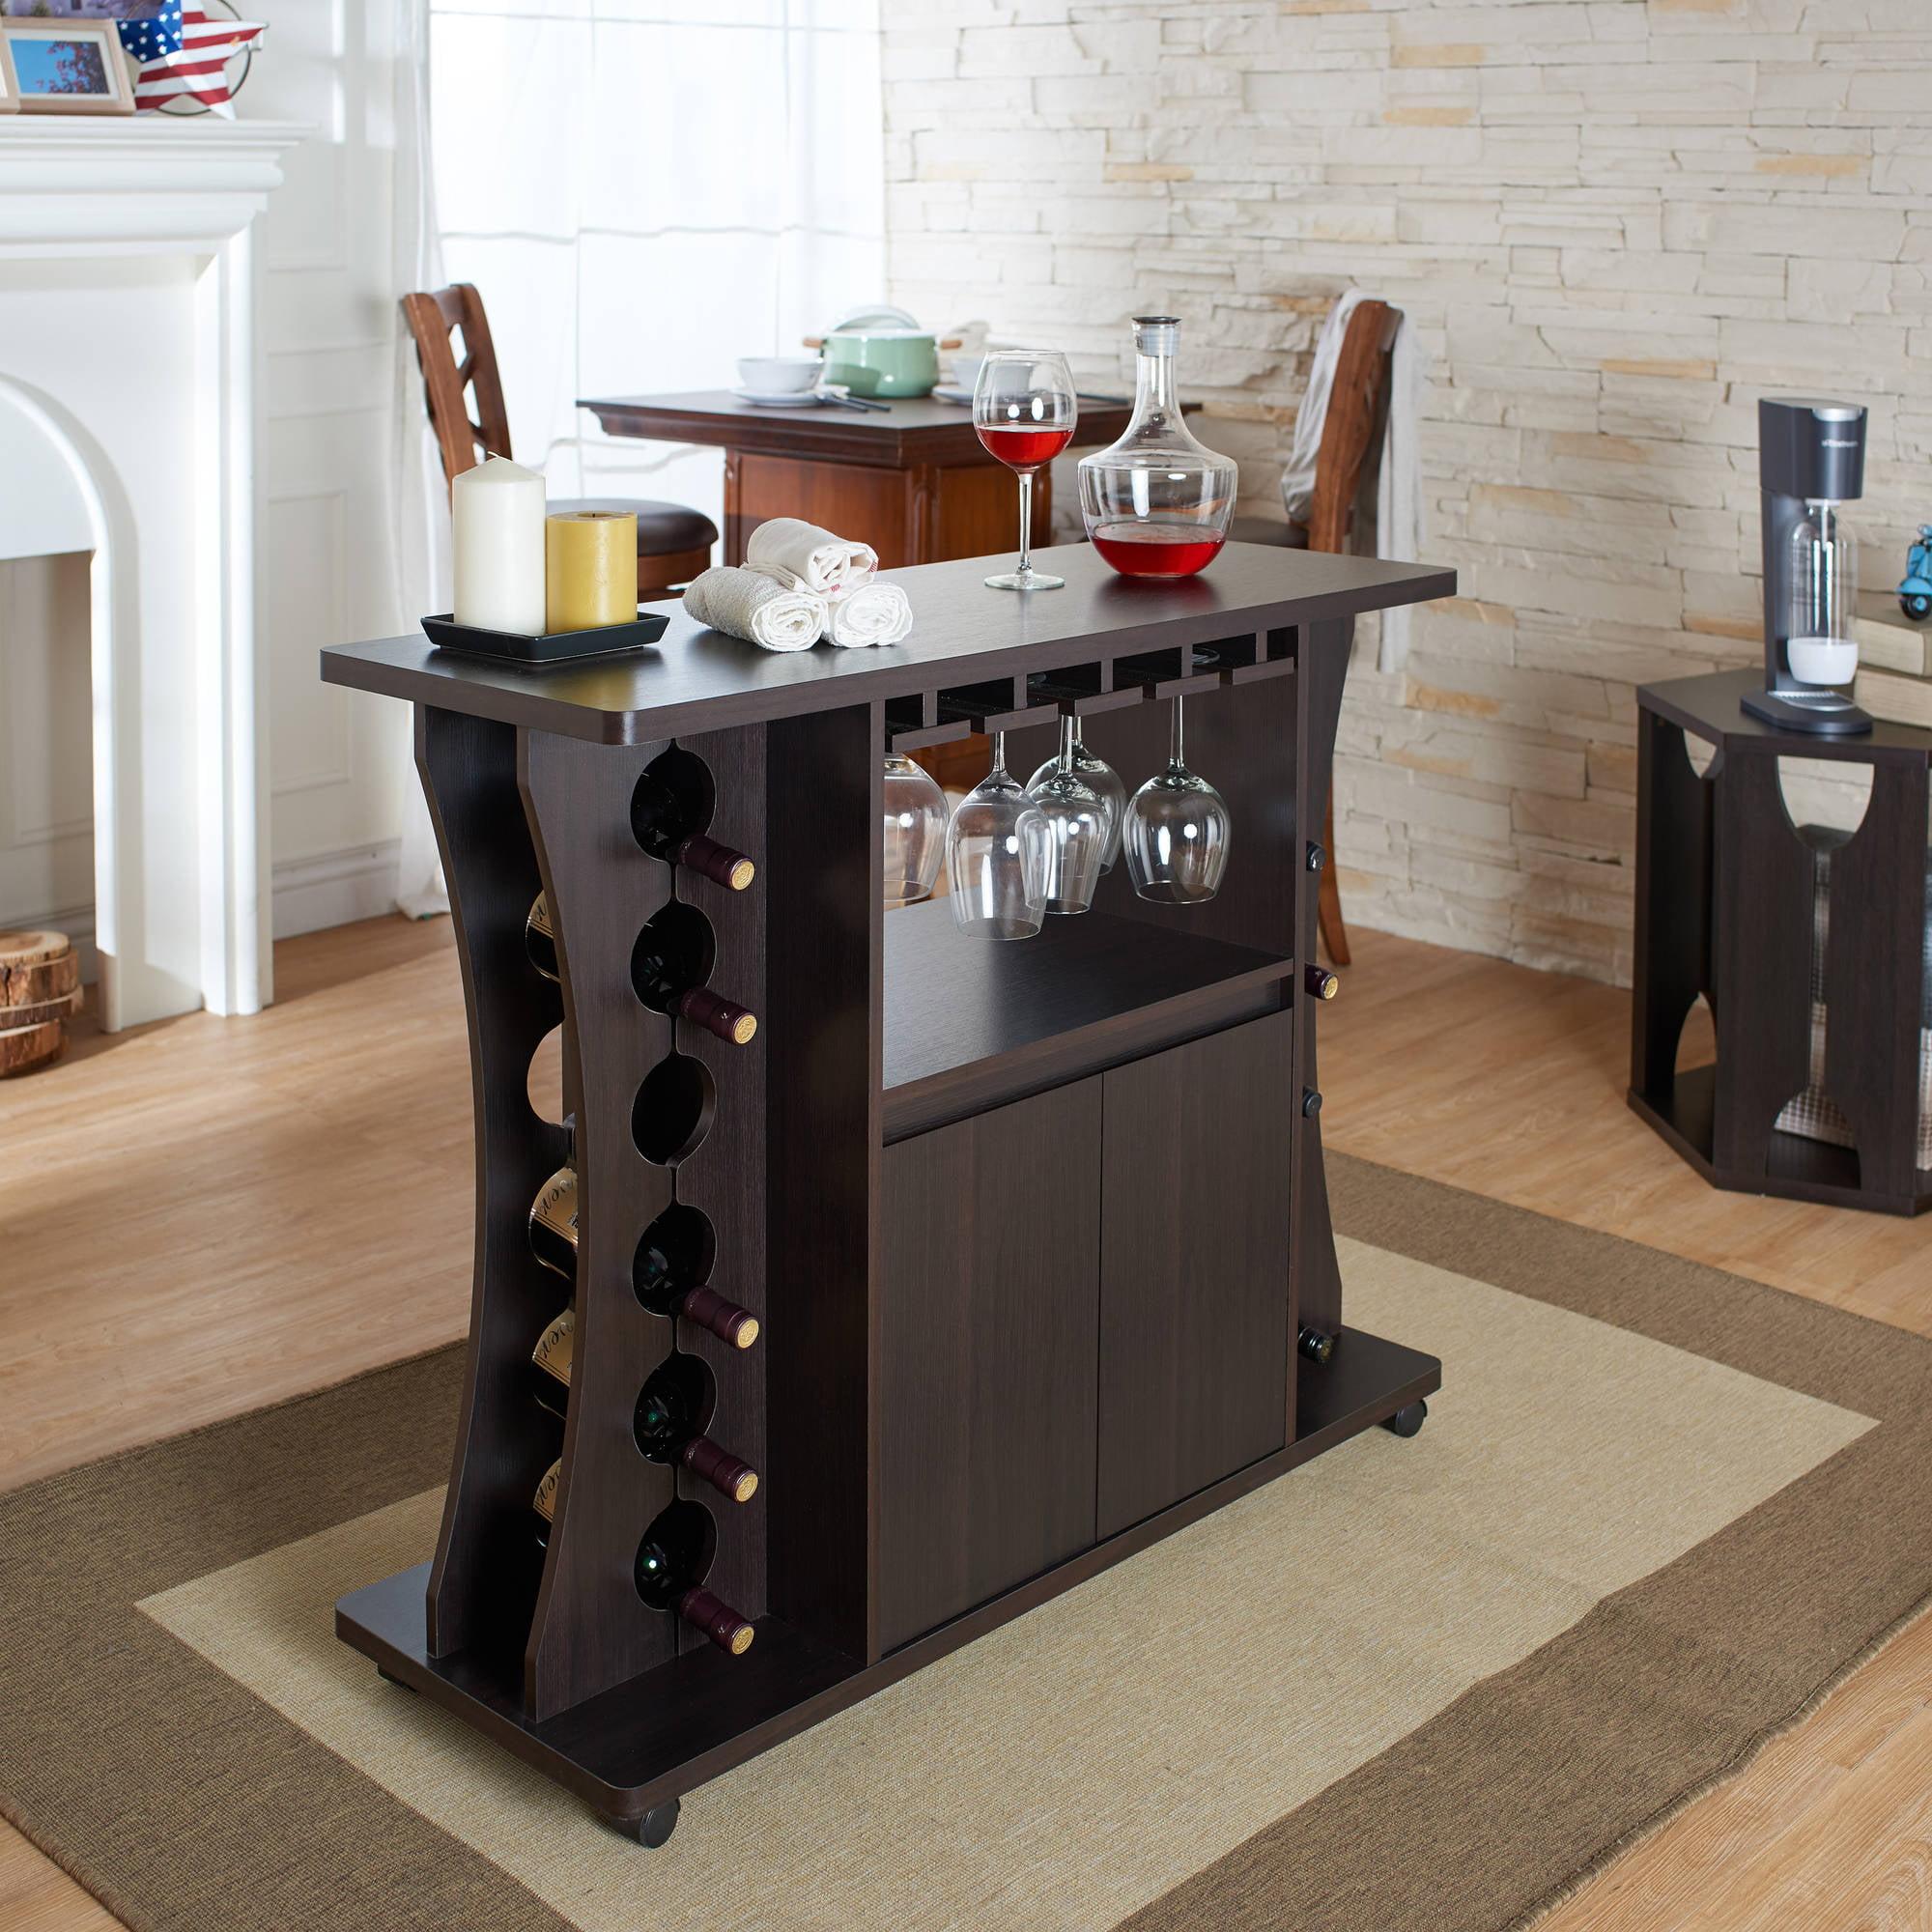 Furniture of America Alton Modern Multi-Storage Buffet, Espresso